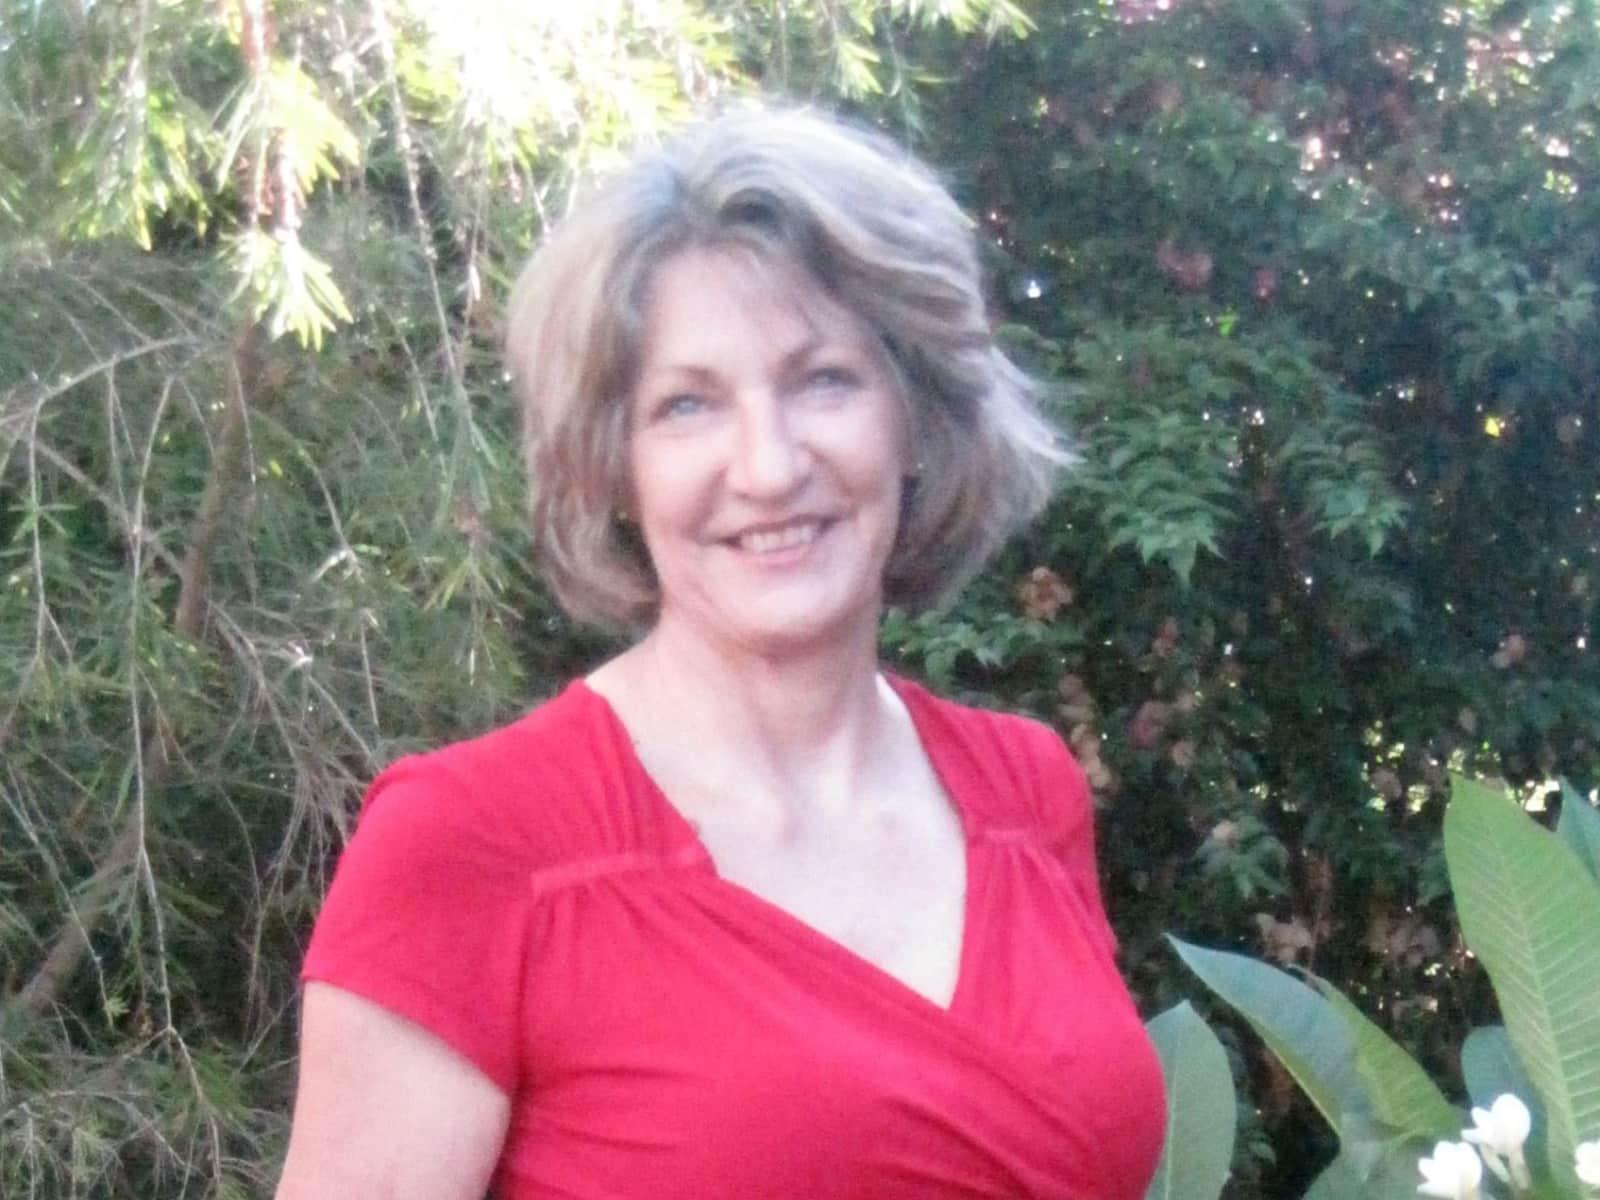 Josie from Perth, Western Australia, Australia